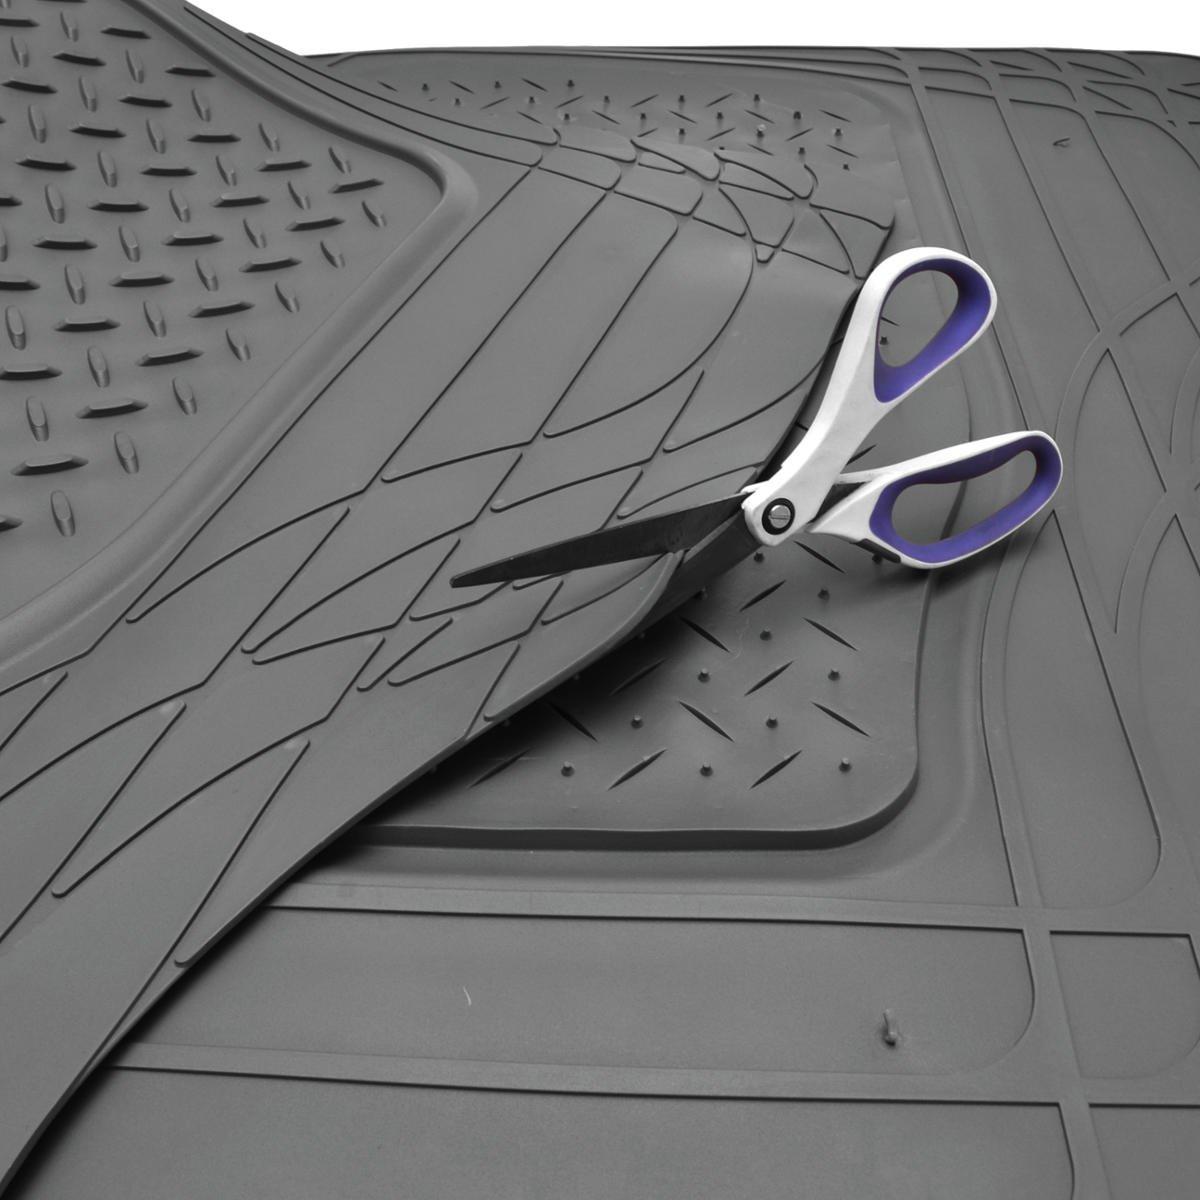 Odorless MT-773-884-GR Motor Trend Flextough Rubber Car Floor Mats /& Cargo Trunk Mat Set Black Heavy Duty Extreme Duty Gray